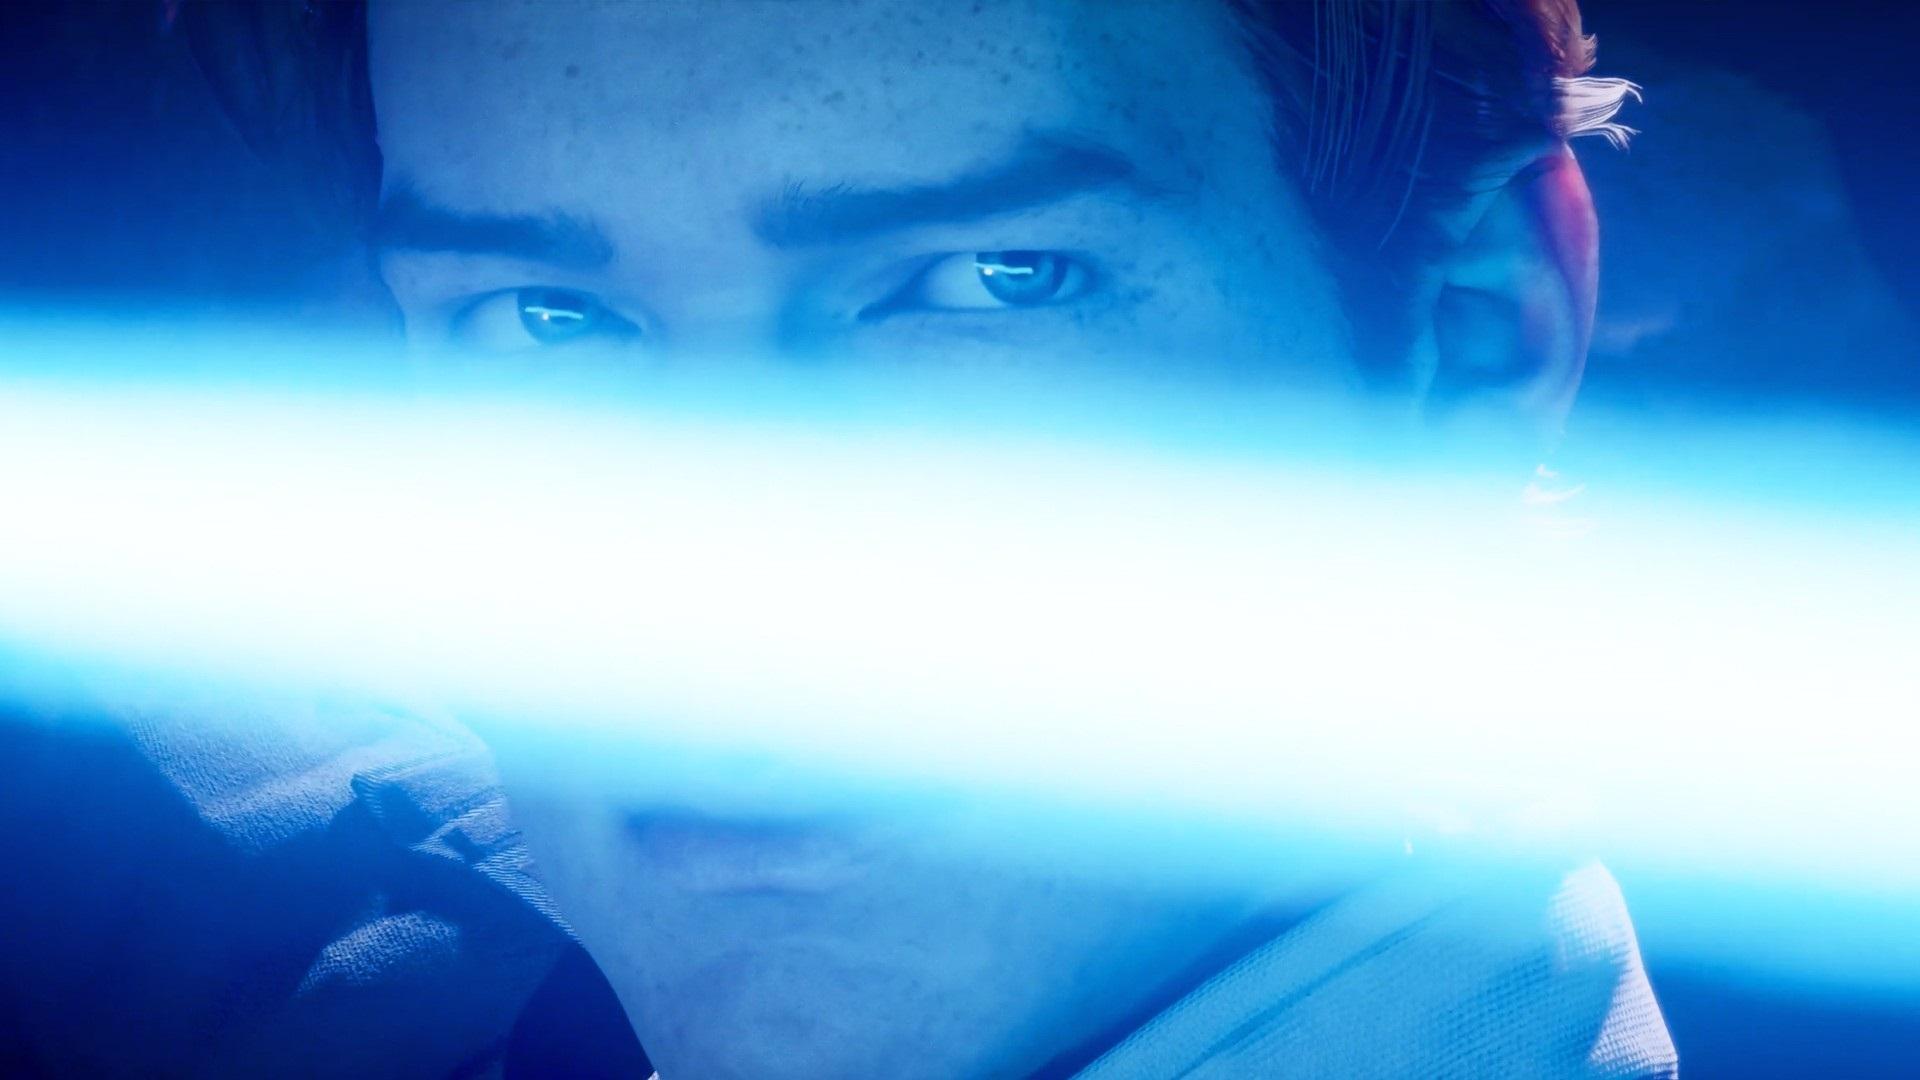 No, you don't need 32GB of RAM to run Star Wars Jedi: Fallen Order screenshot